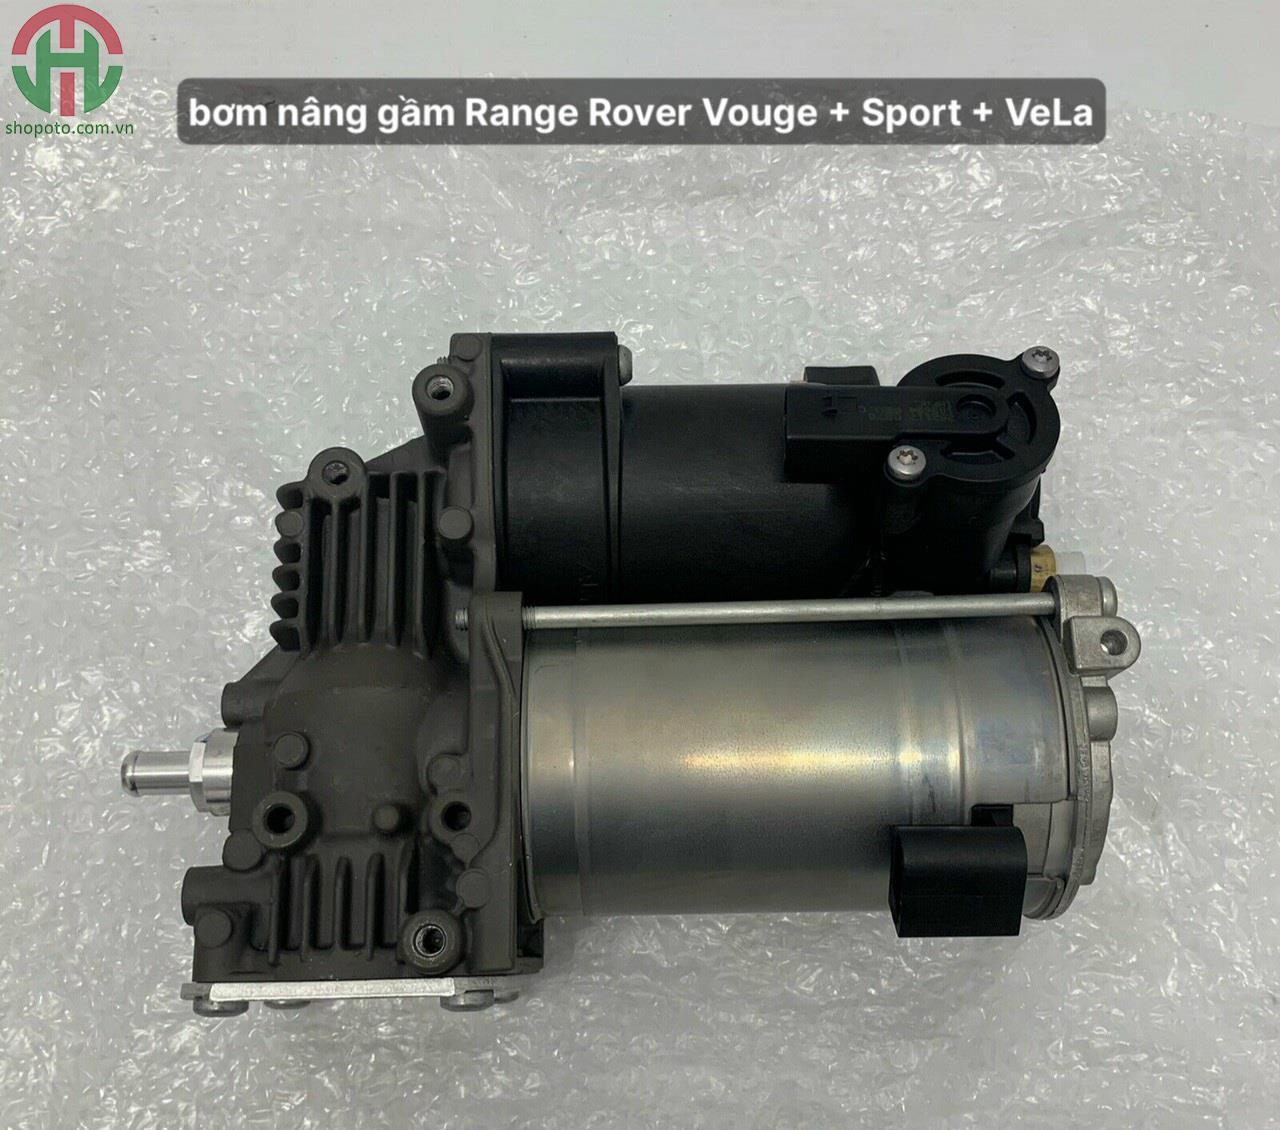 Bơm nâng gầm Range Rover Velar